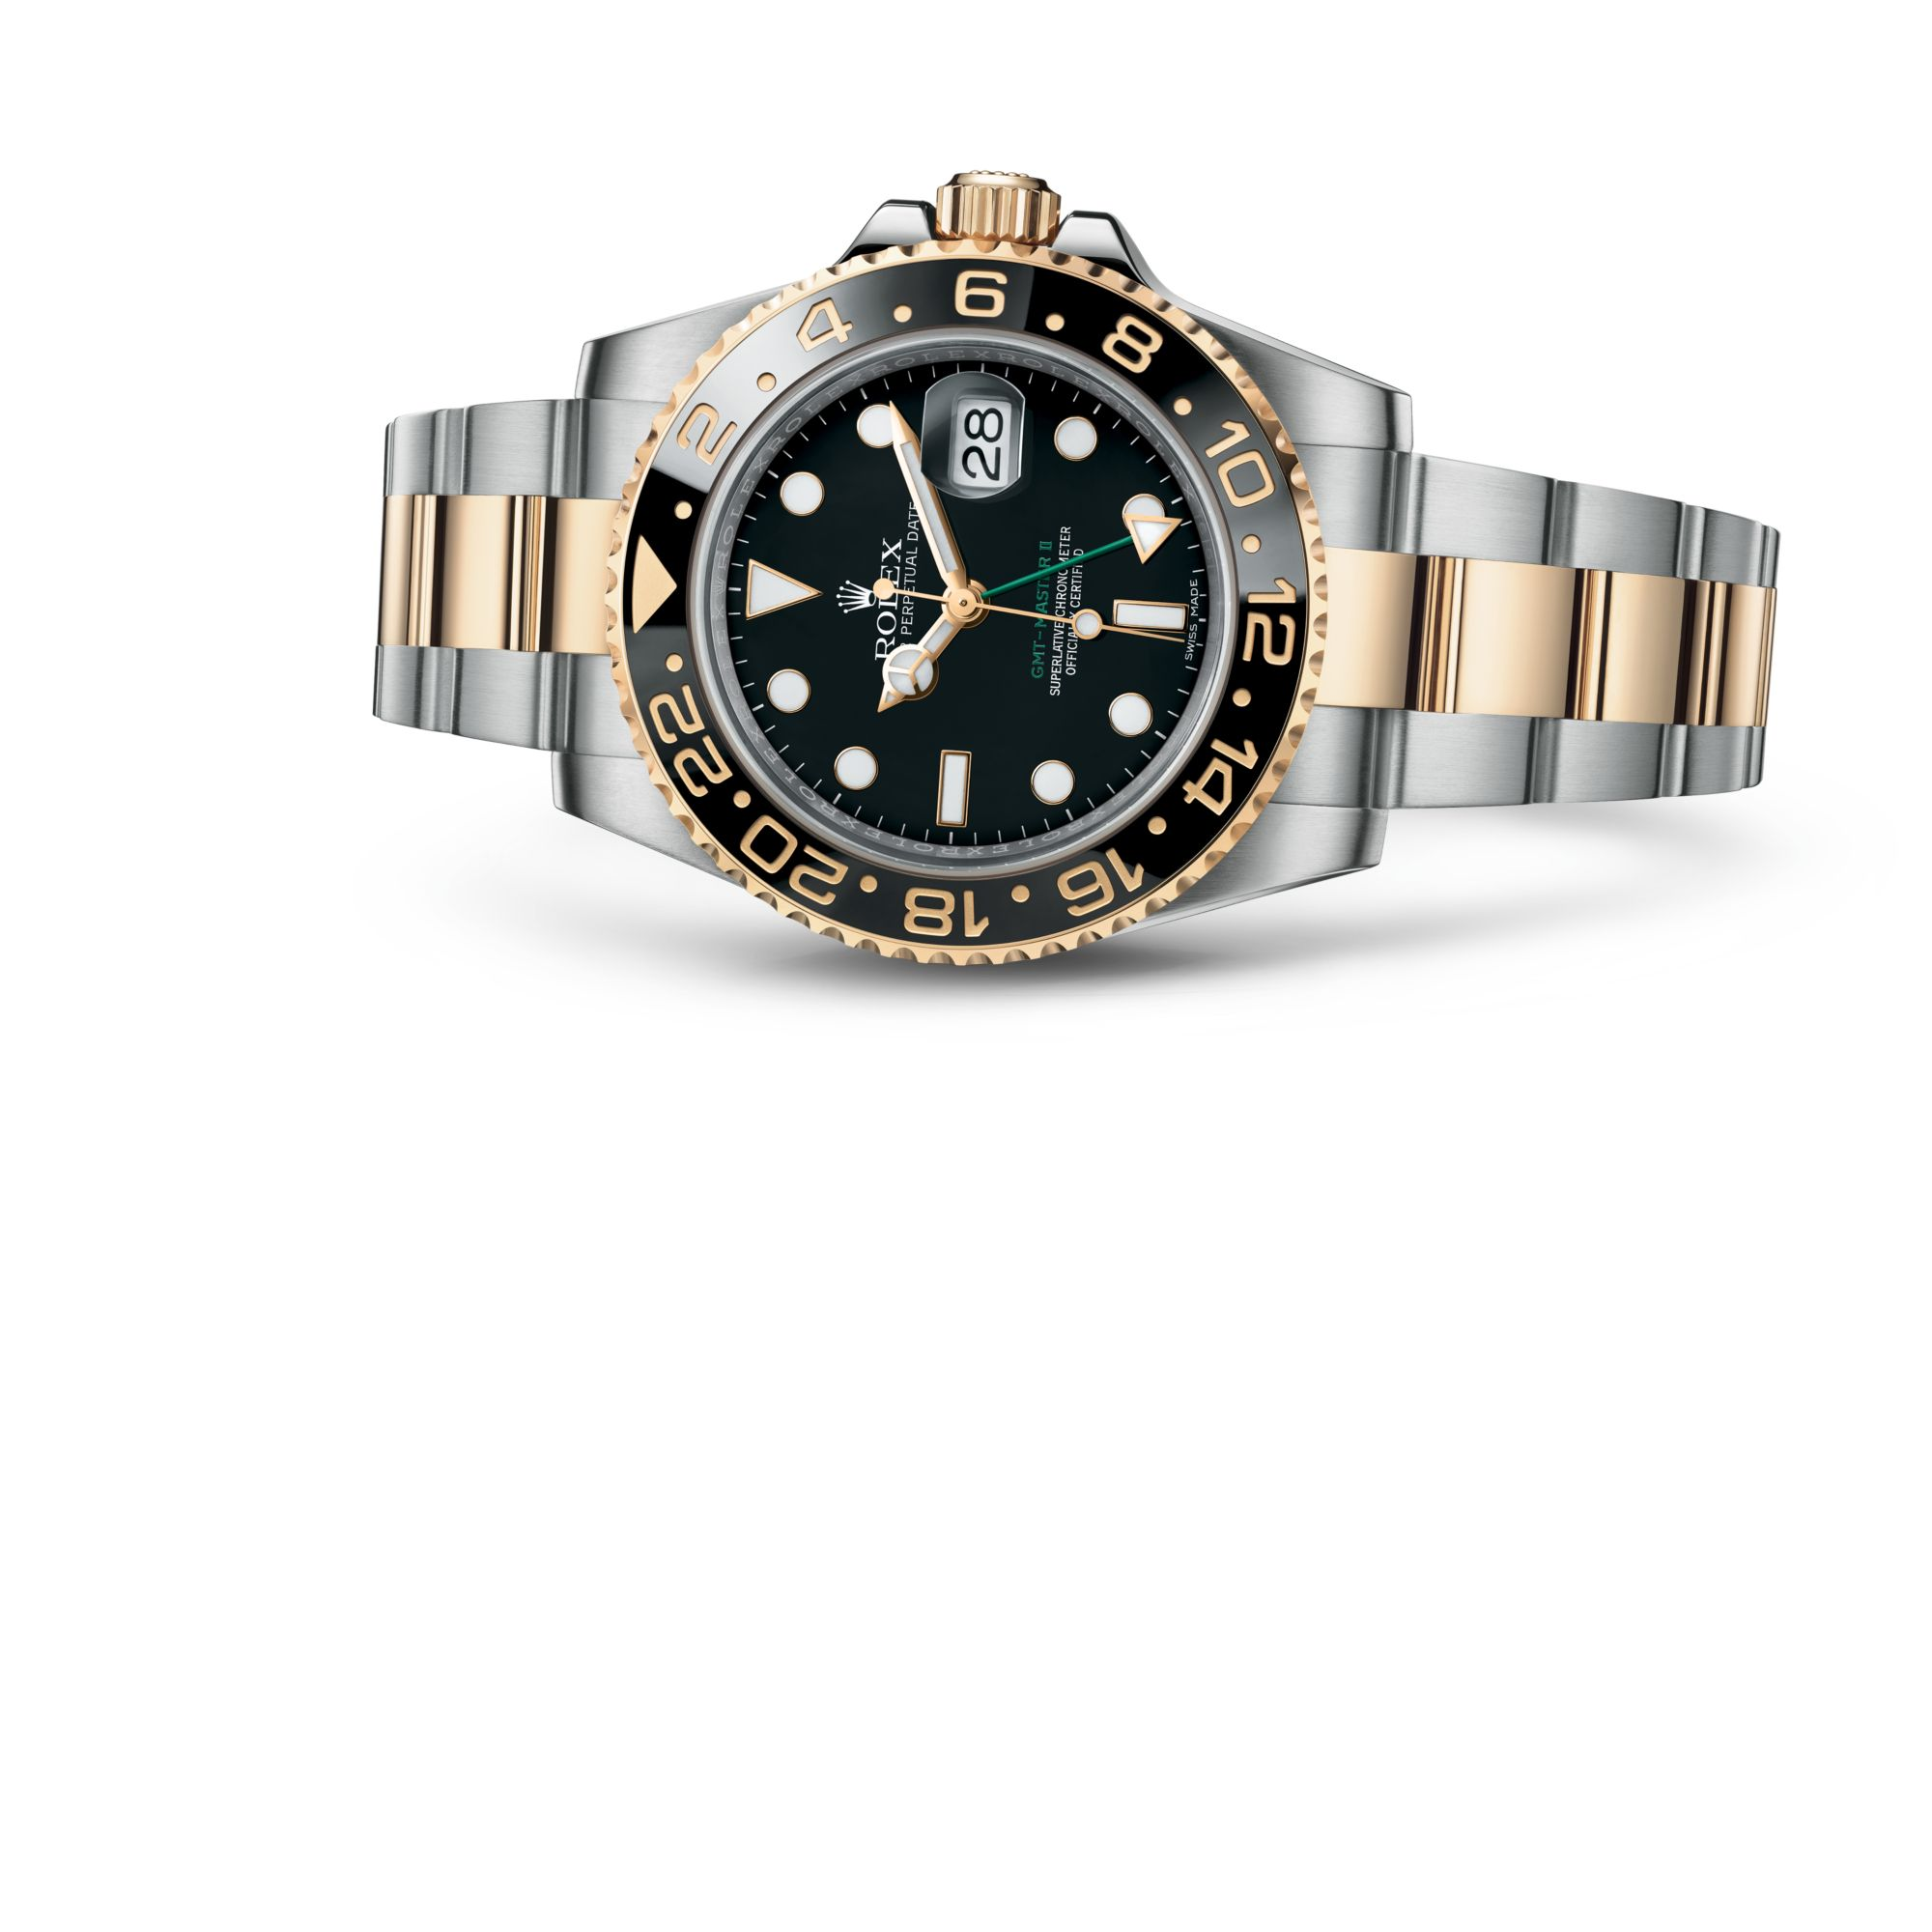 Rolex GMT-Master II M116713LN-0001